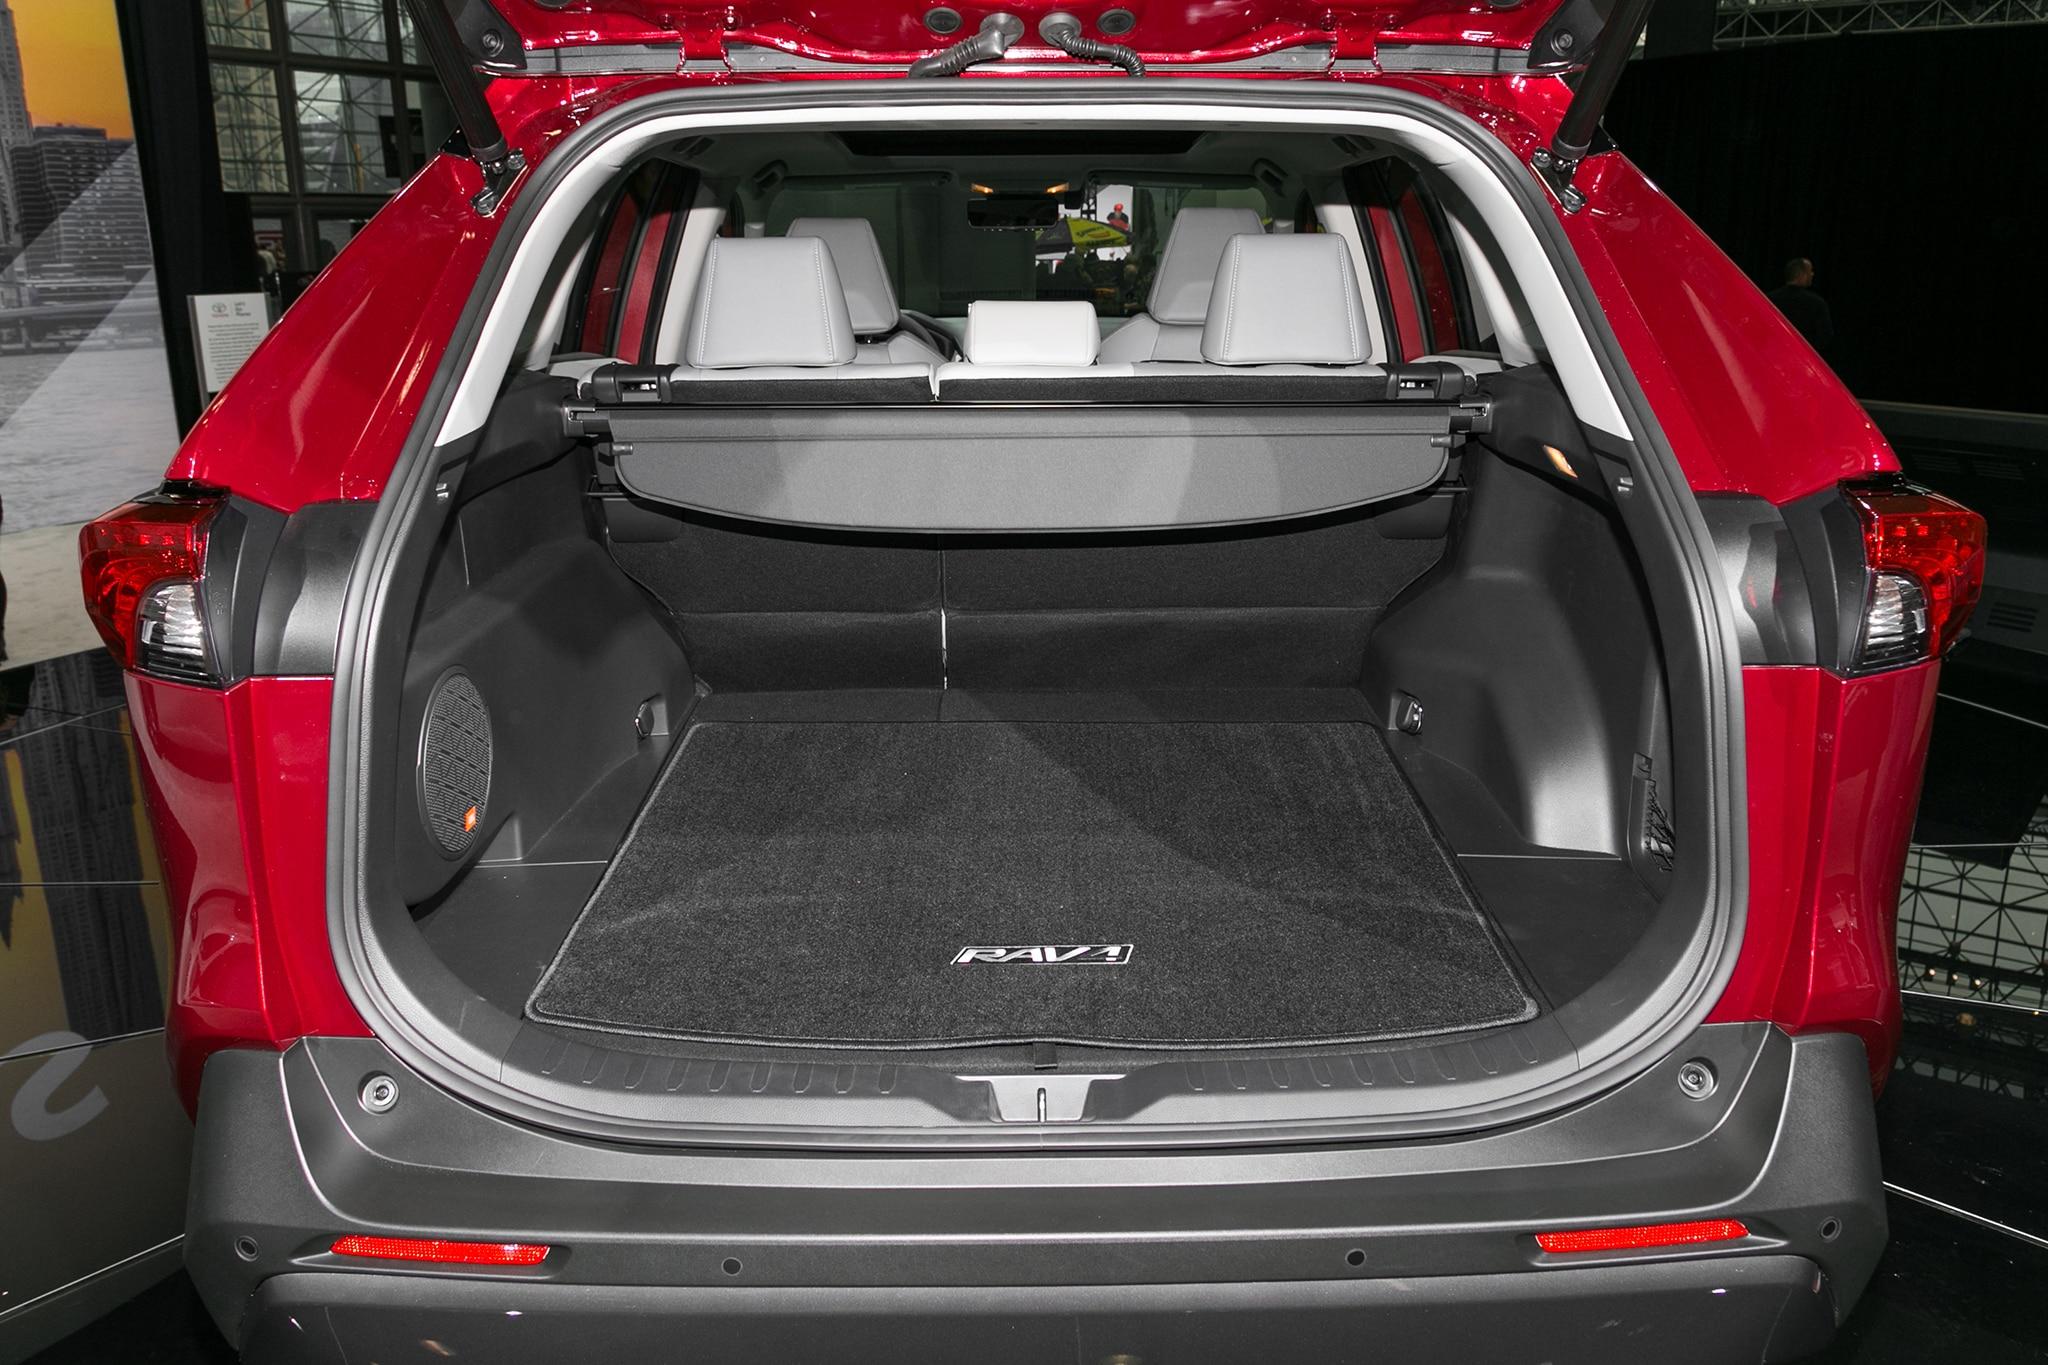 2019 Toyota RAV4 cargo 04 - Motor Trend en Español